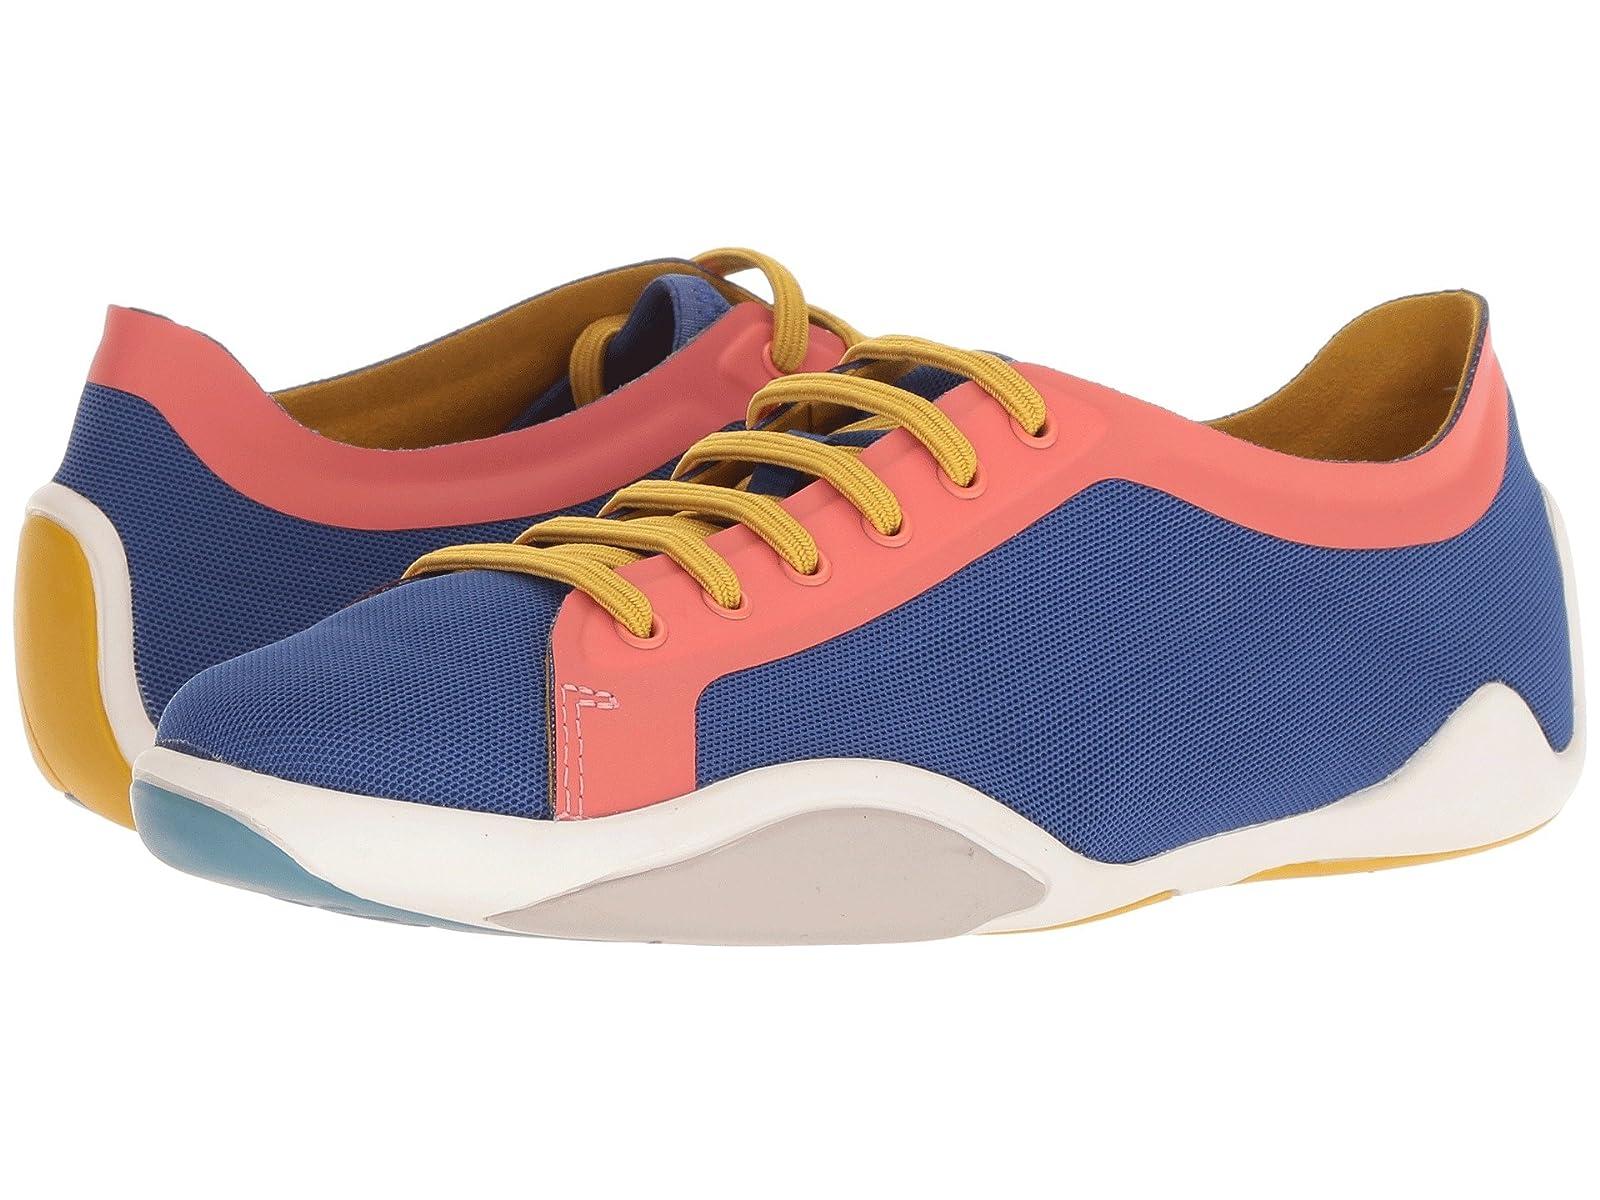 Camper Noshu - K200351Cheap and distinctive eye-catching shoes